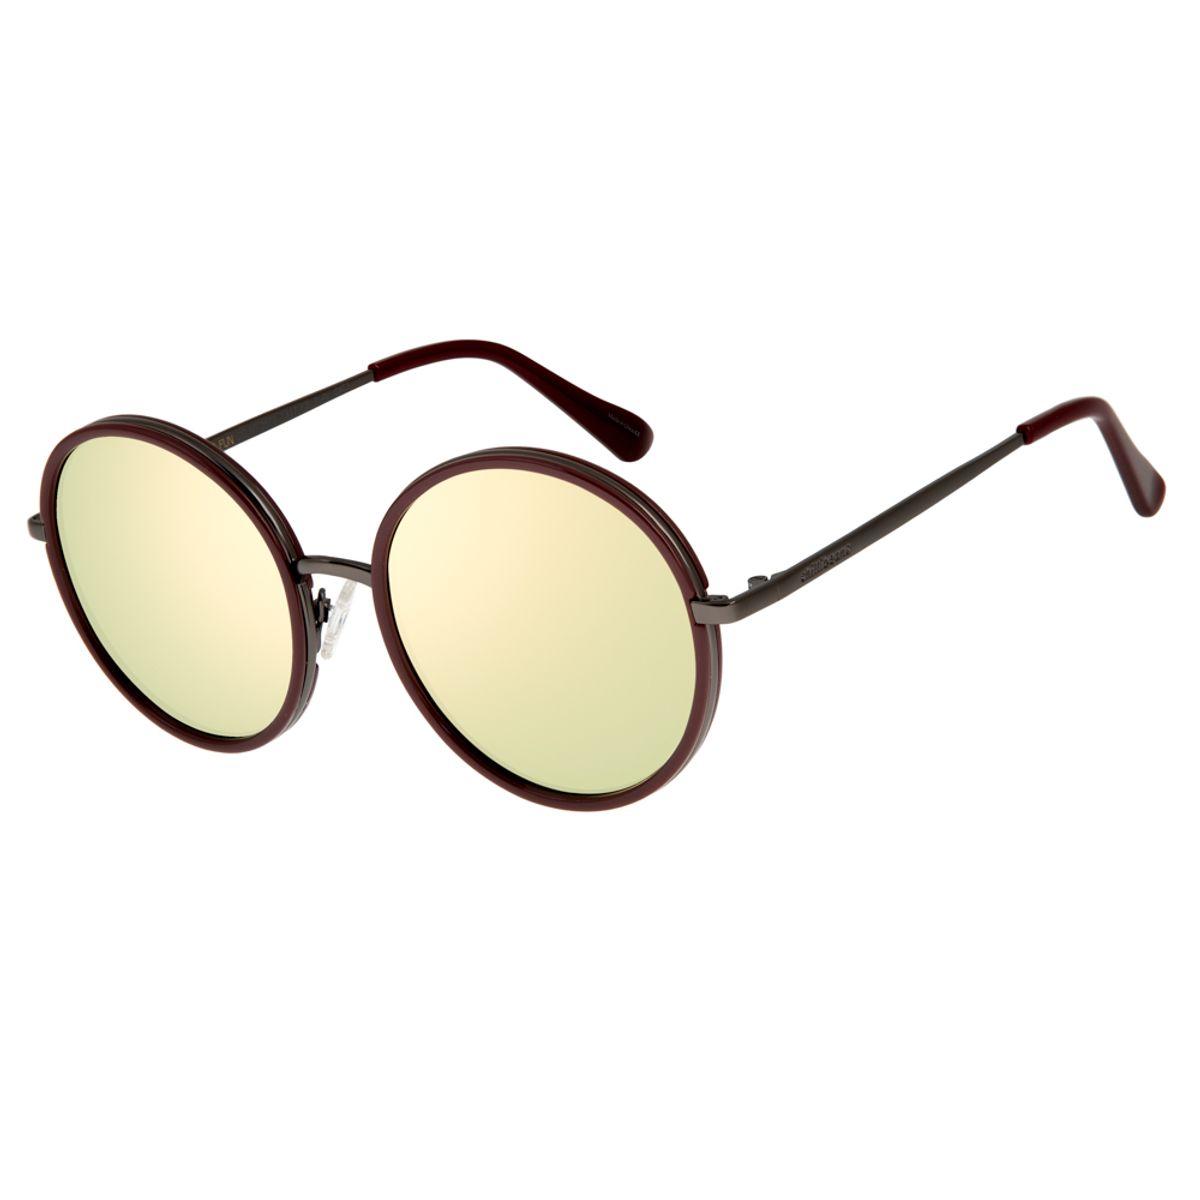 adf42c4a5 Óculos de Sol Feminino Chilli Beans Vinho 2570 - OC.MT.2570.1317 M. REF:  OC.MT.2570.1317. OC.